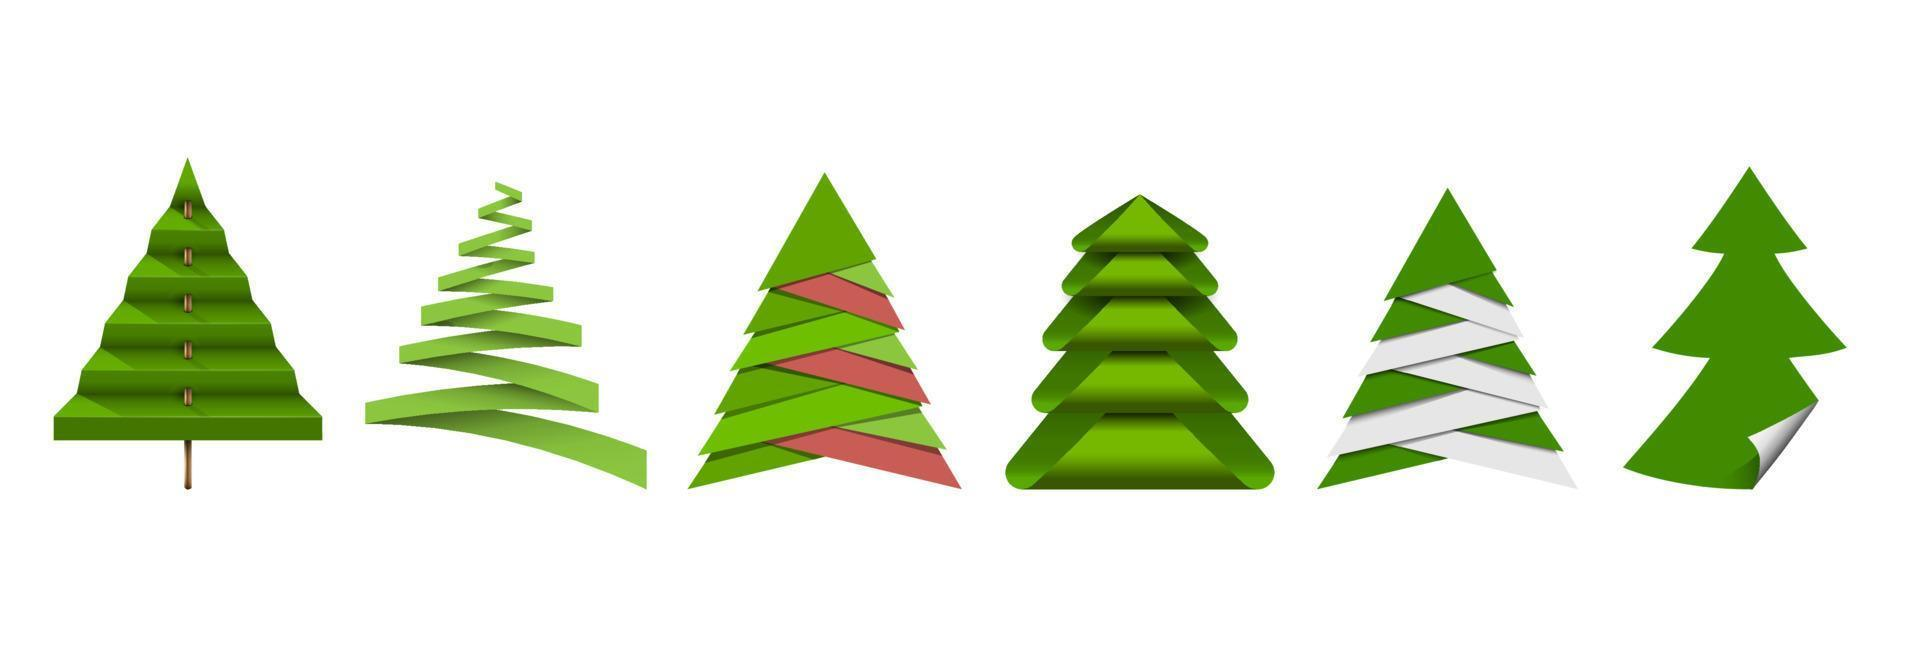 árvore de natal, diferentes elementos de origami de papel vetor